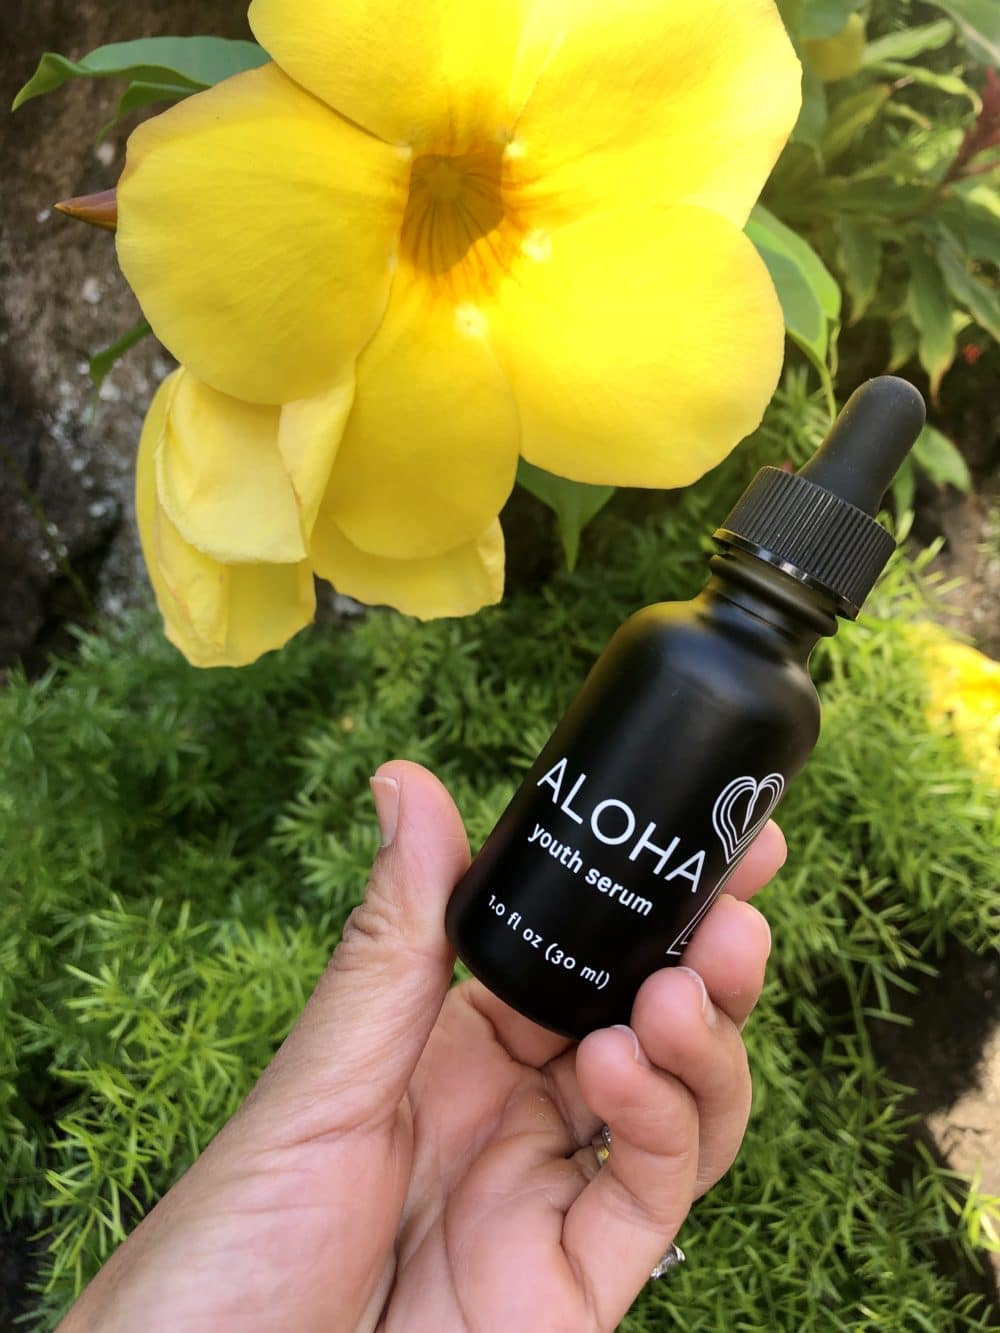 Destaque do produto: Hawaii Edition - Blog de maquiagem e beleza